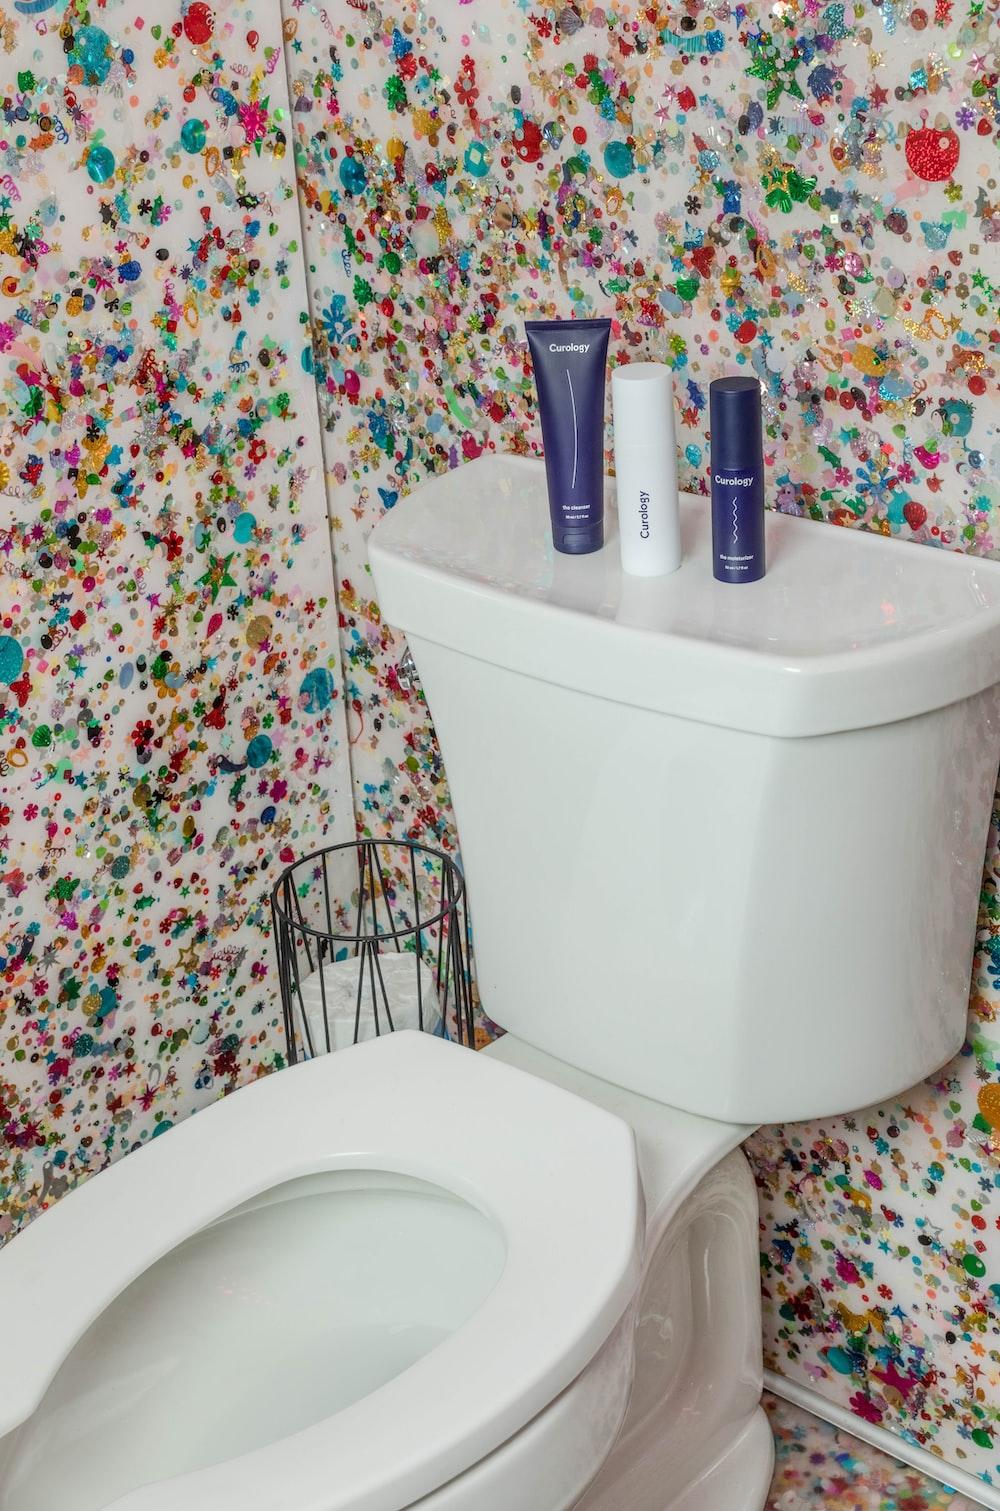 white toilet bowl with cistern